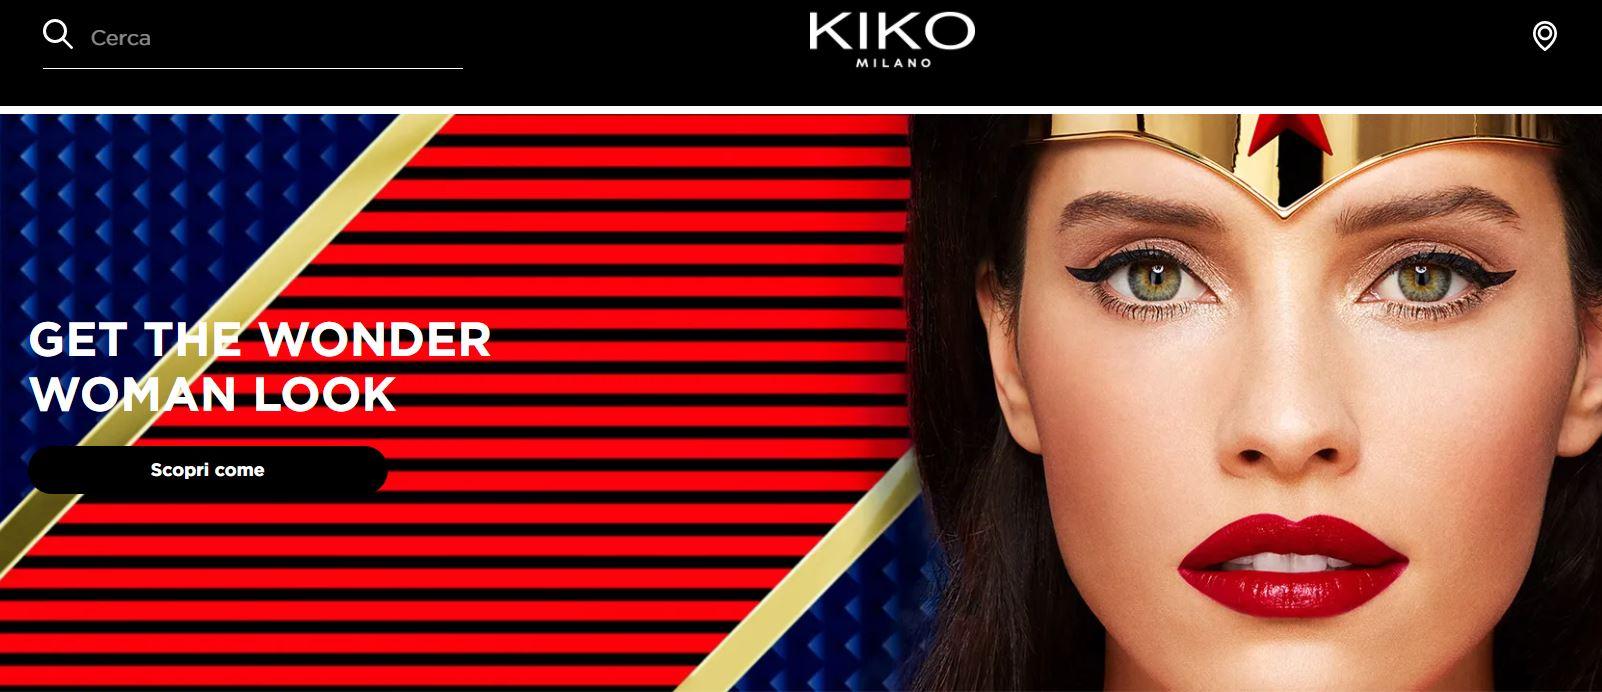 kiko collezione wonder woman